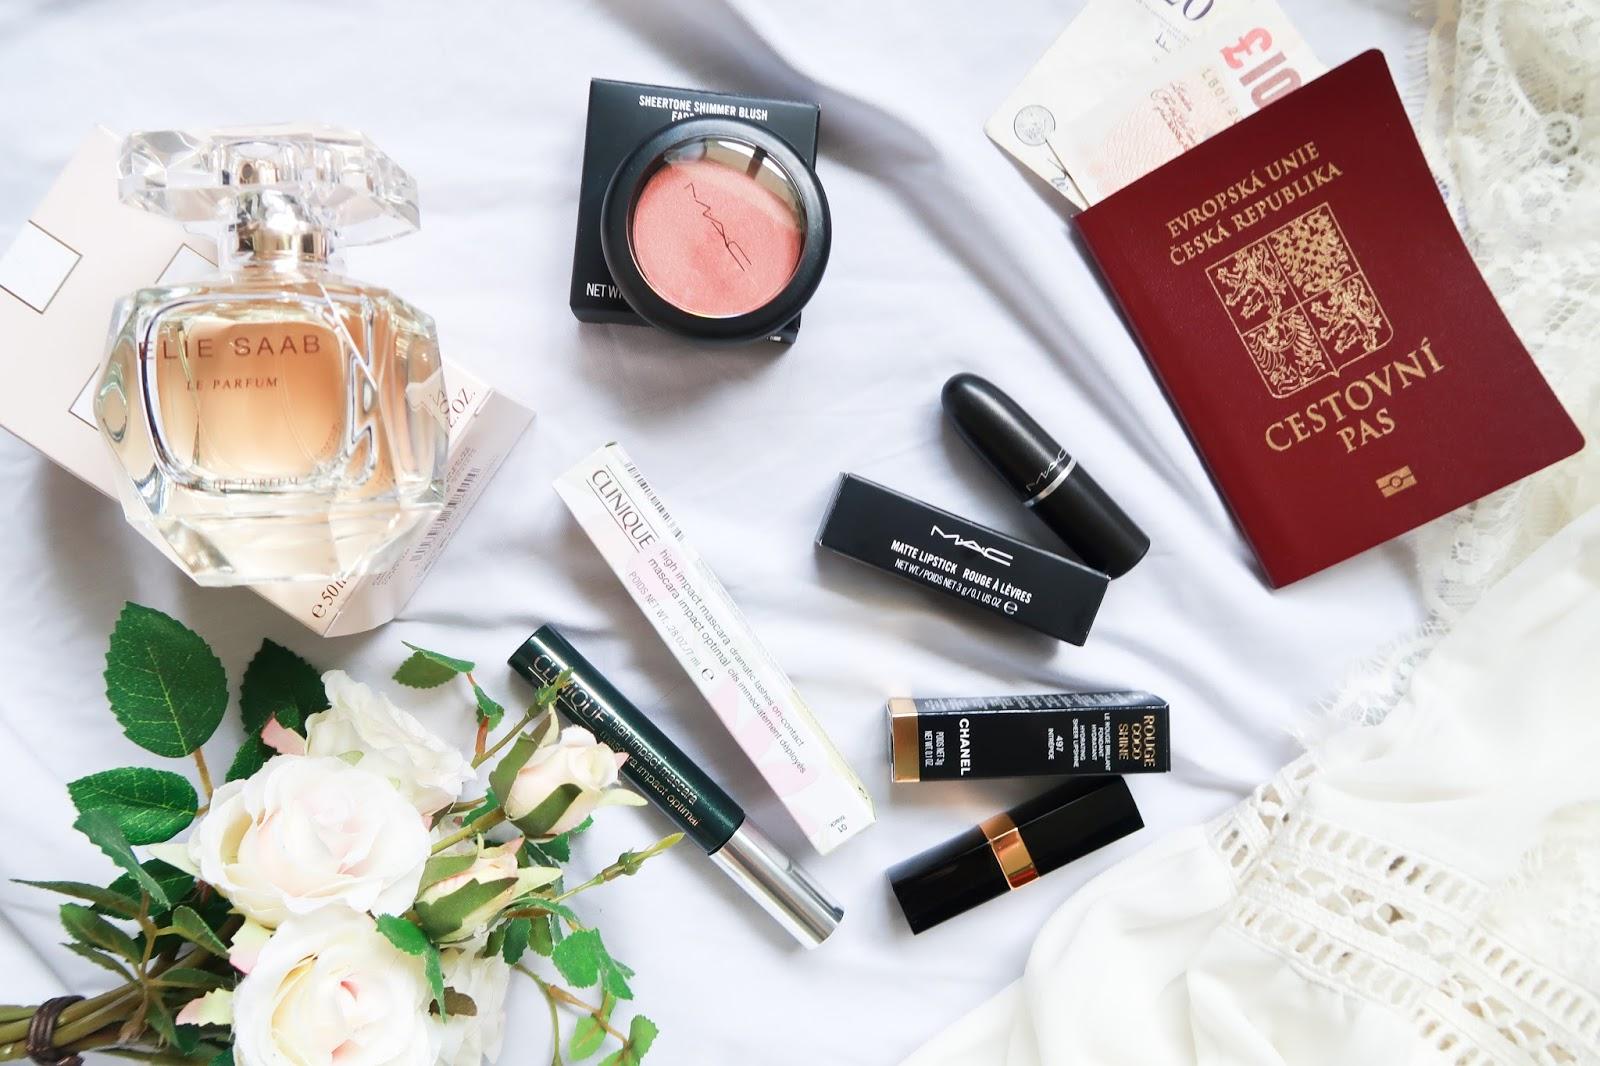 Airport beauty haul